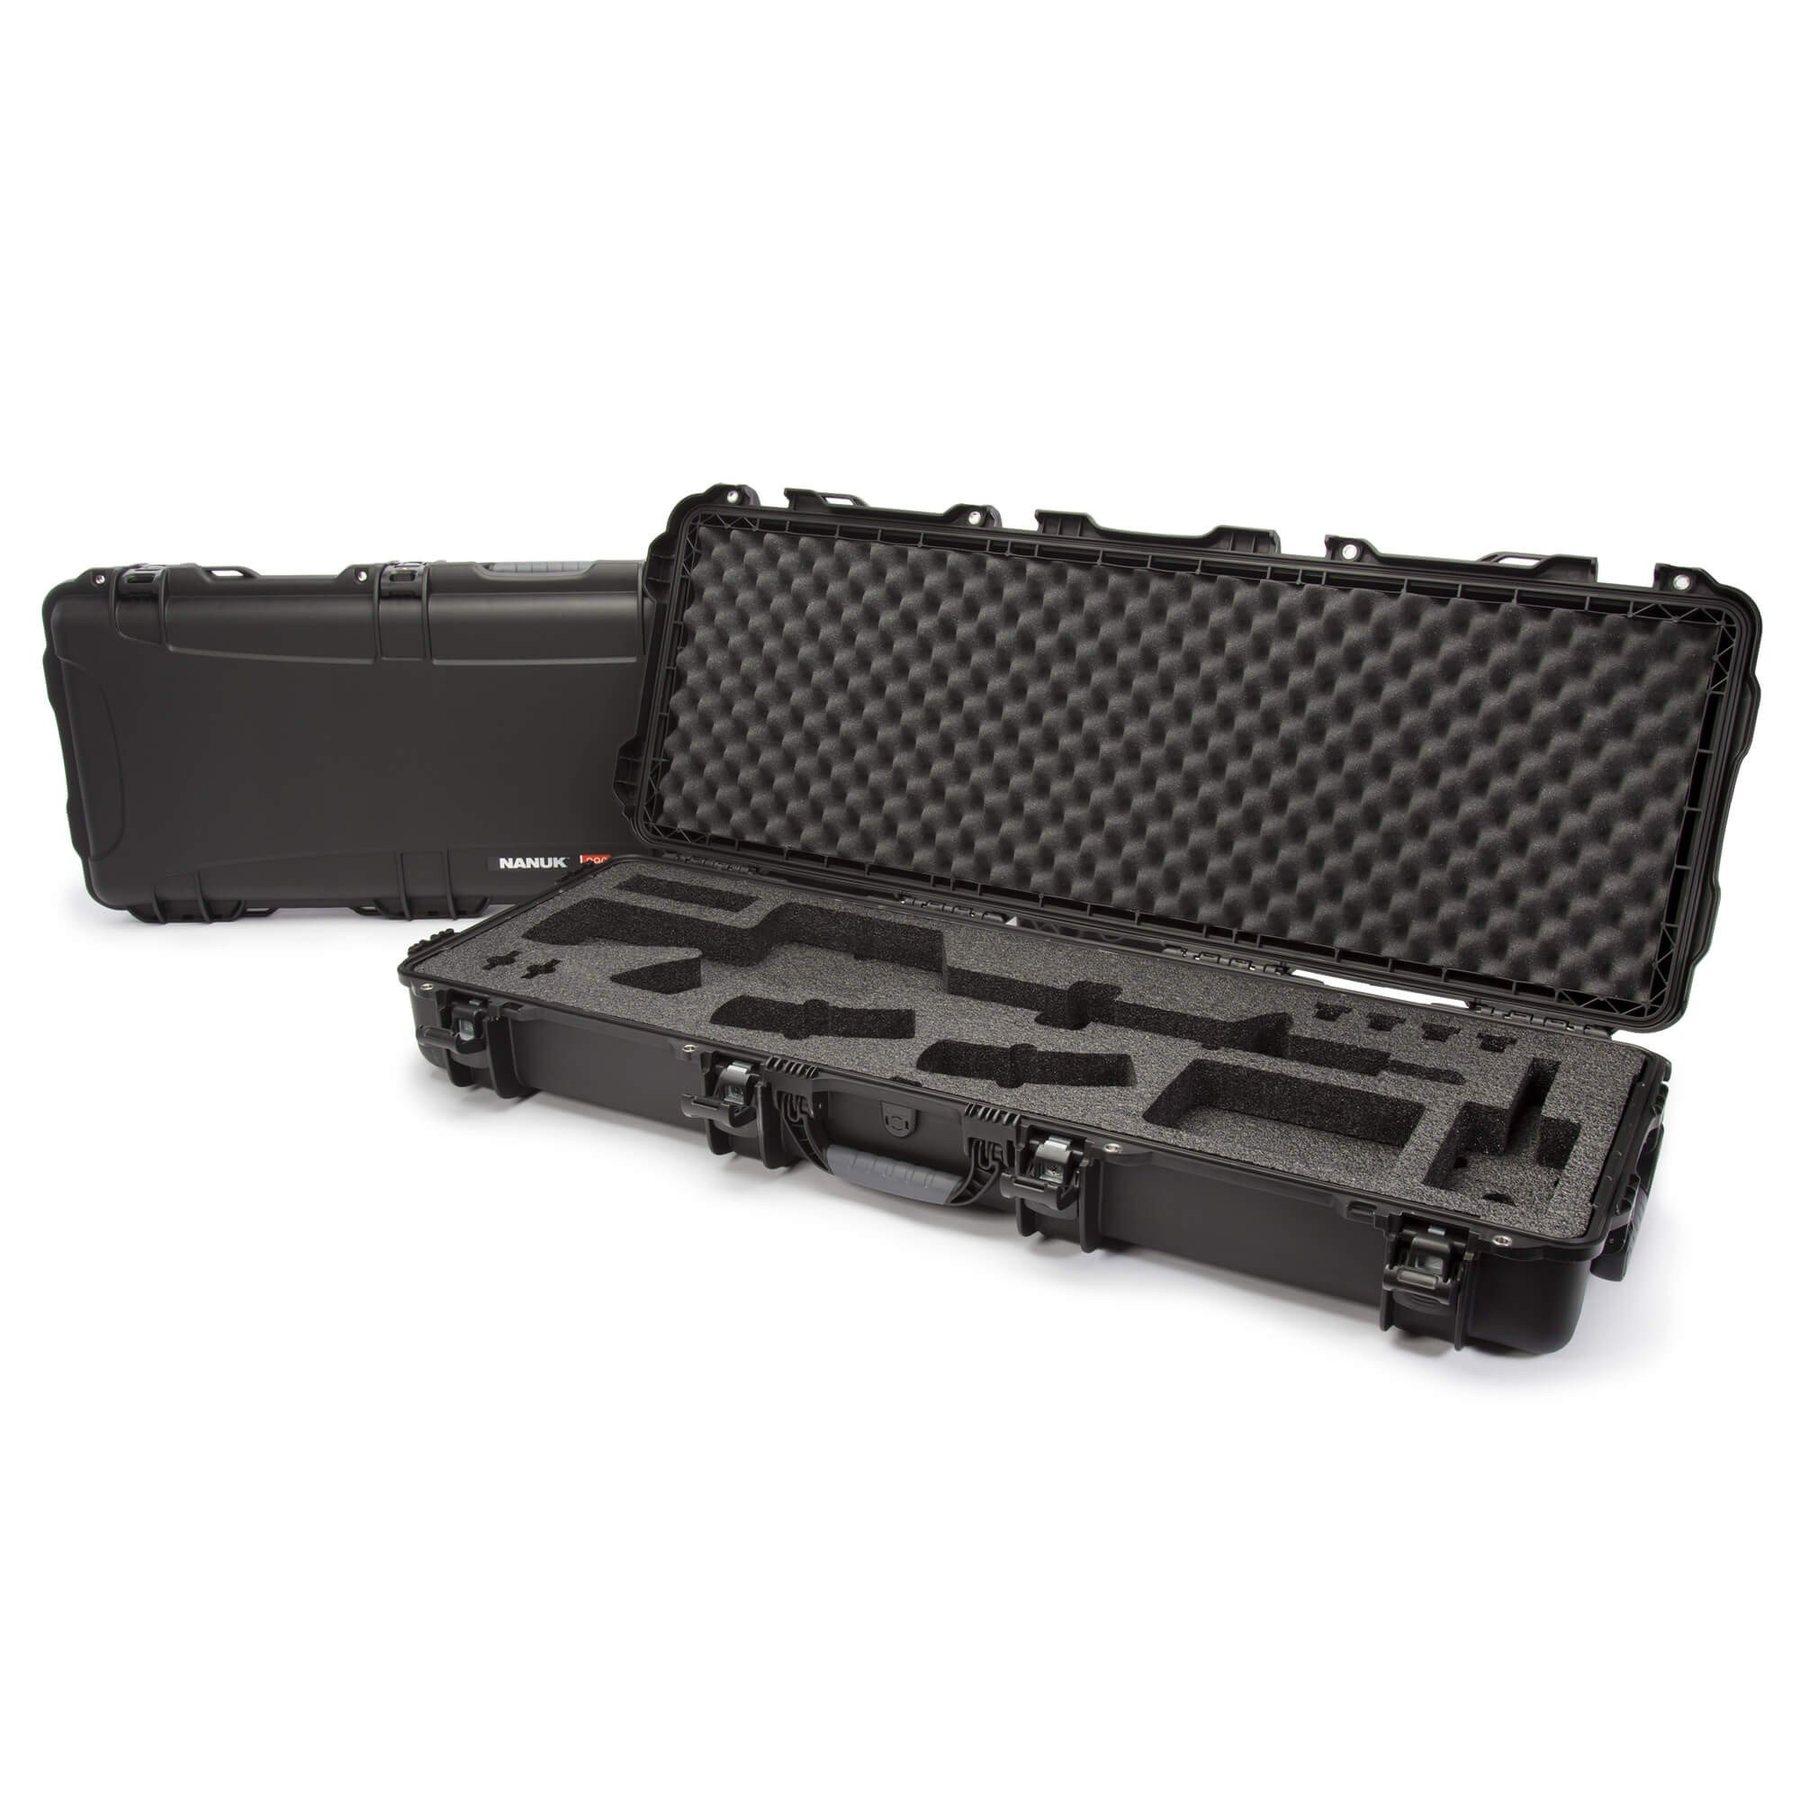 NANUK 990 AR 15 Foam Set - Schaumstoffeinlage